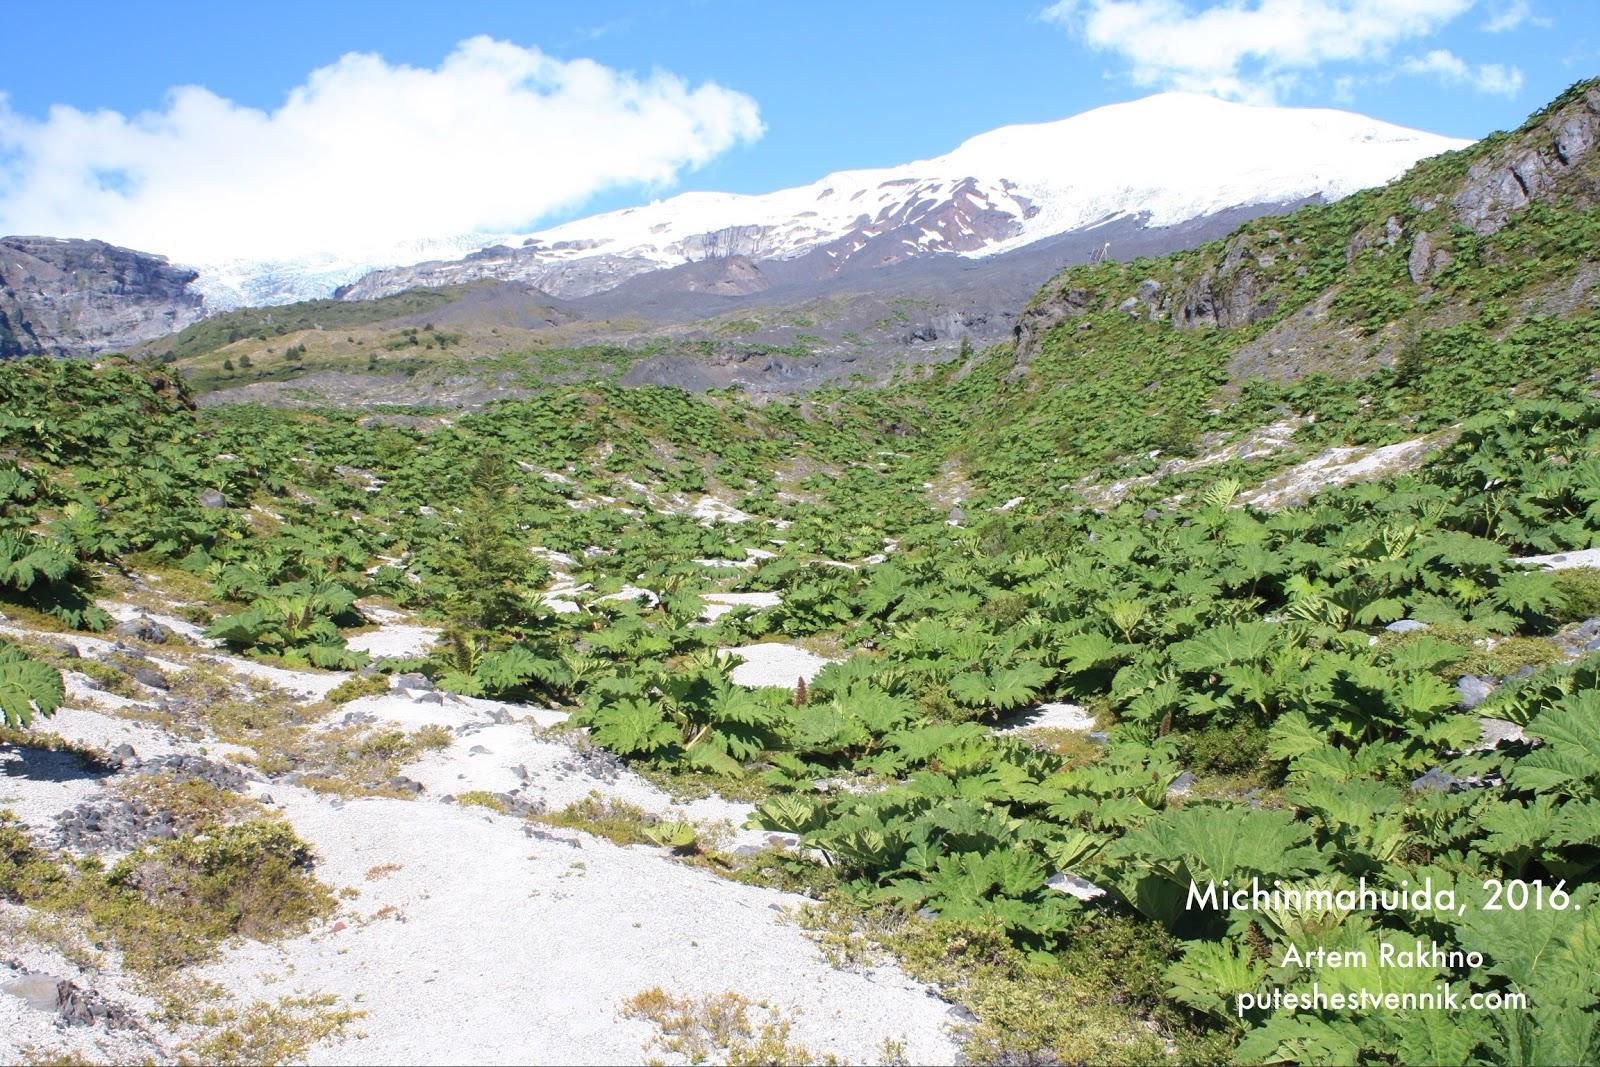 Окрестности вулкана Мичинмахуида